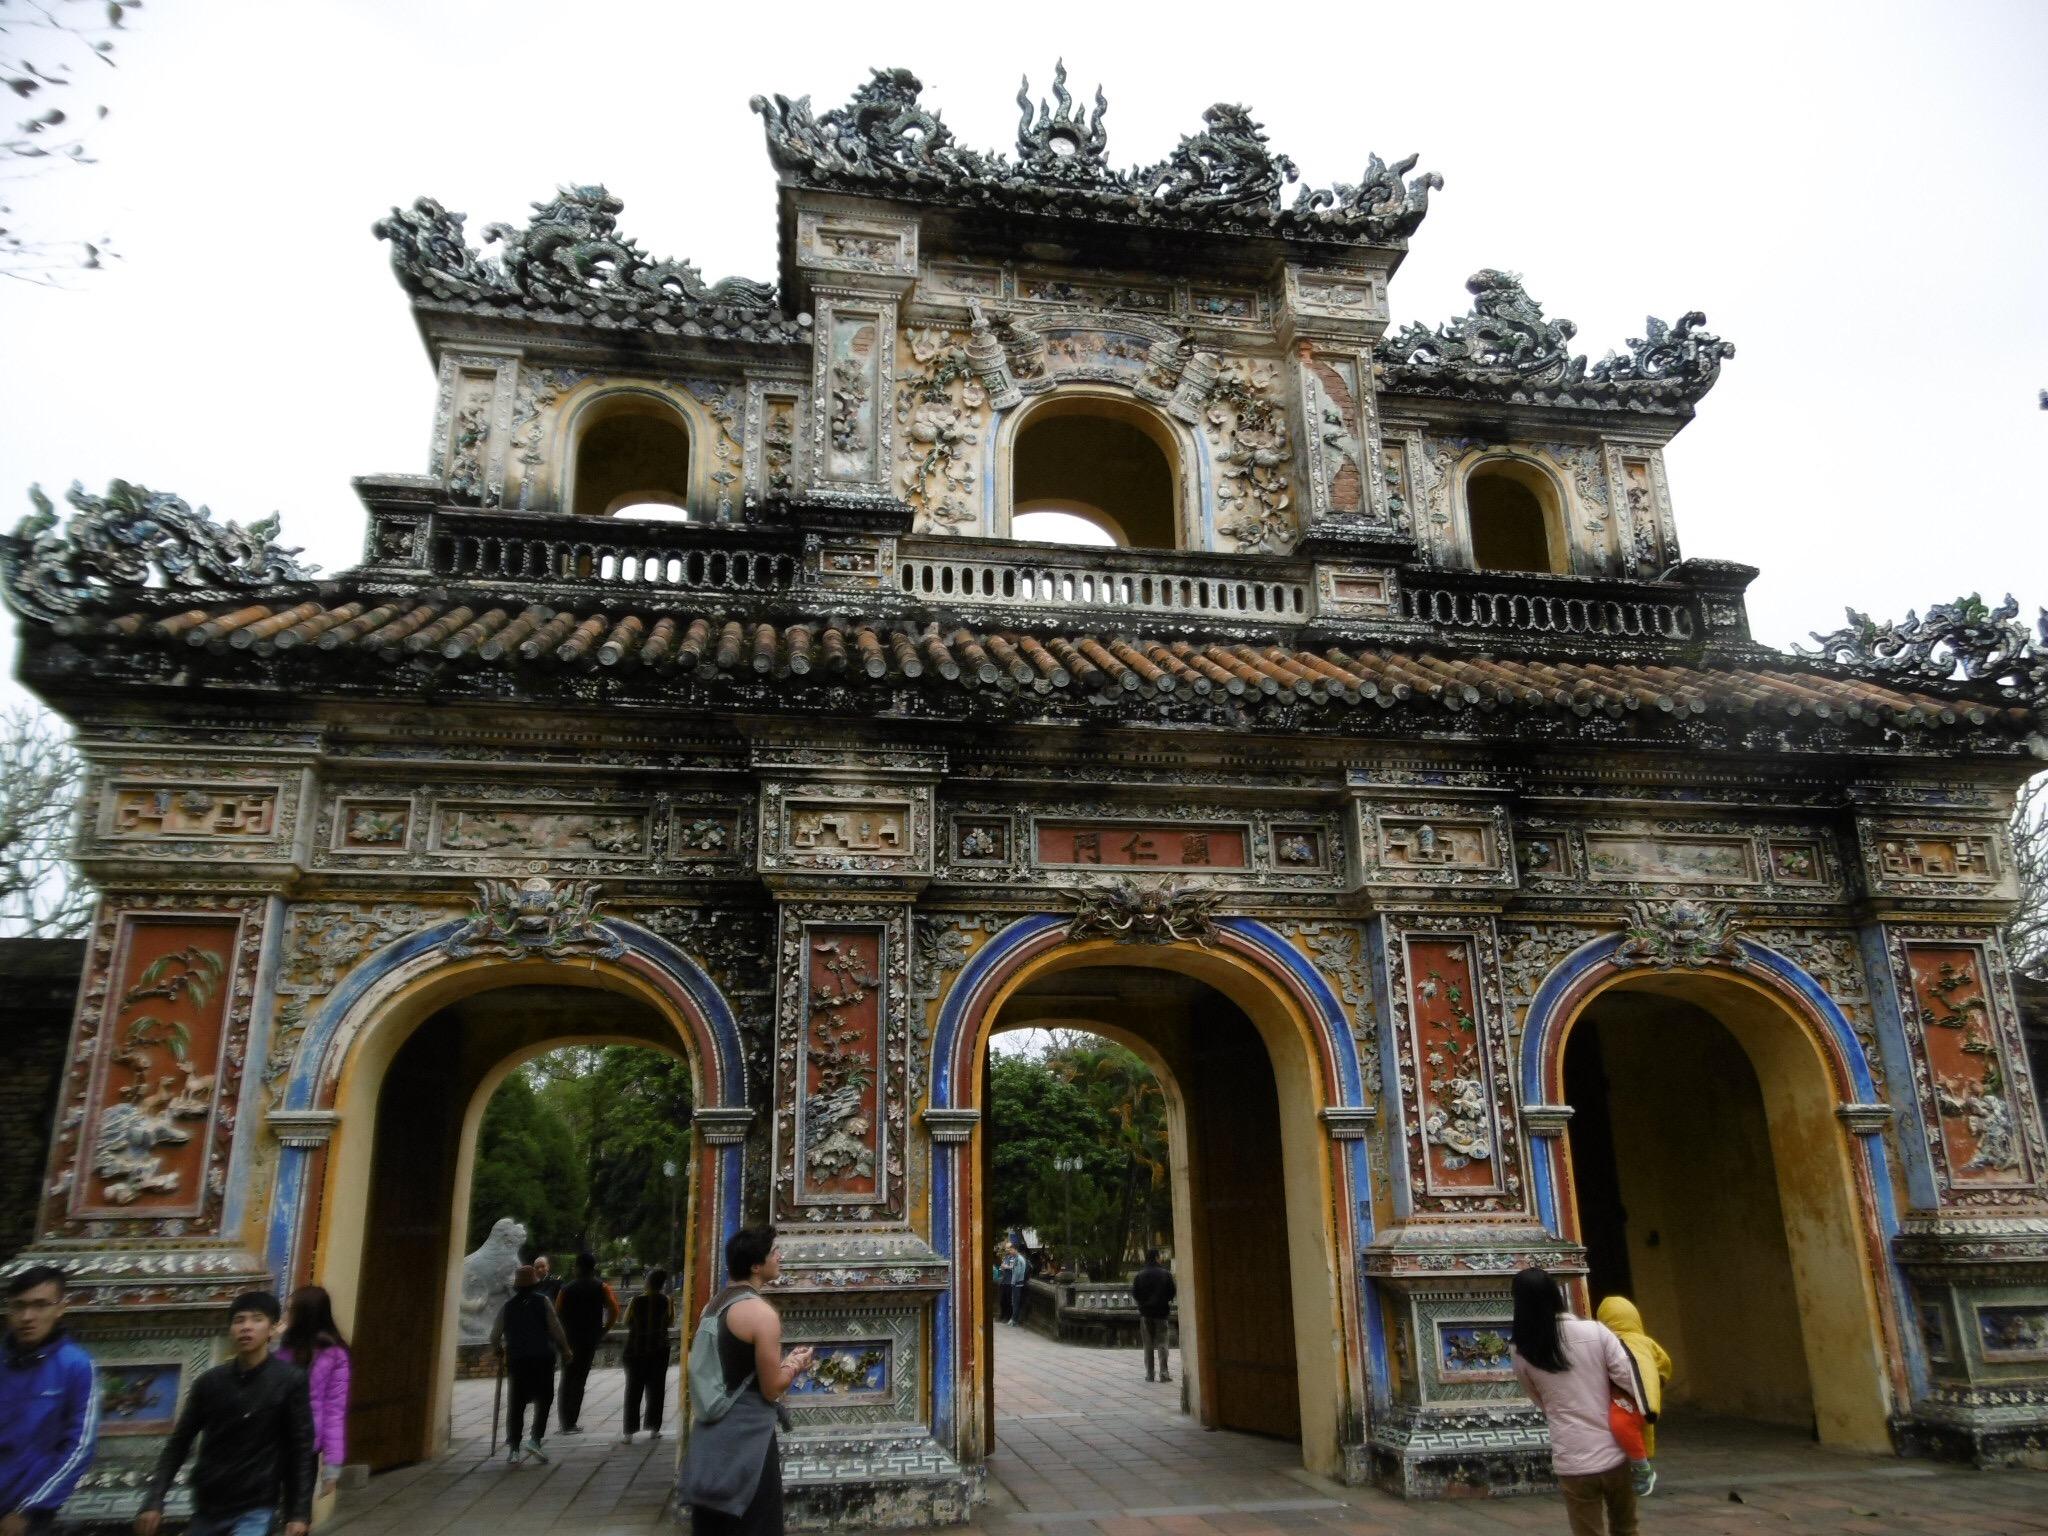 Hue's Forbidden City